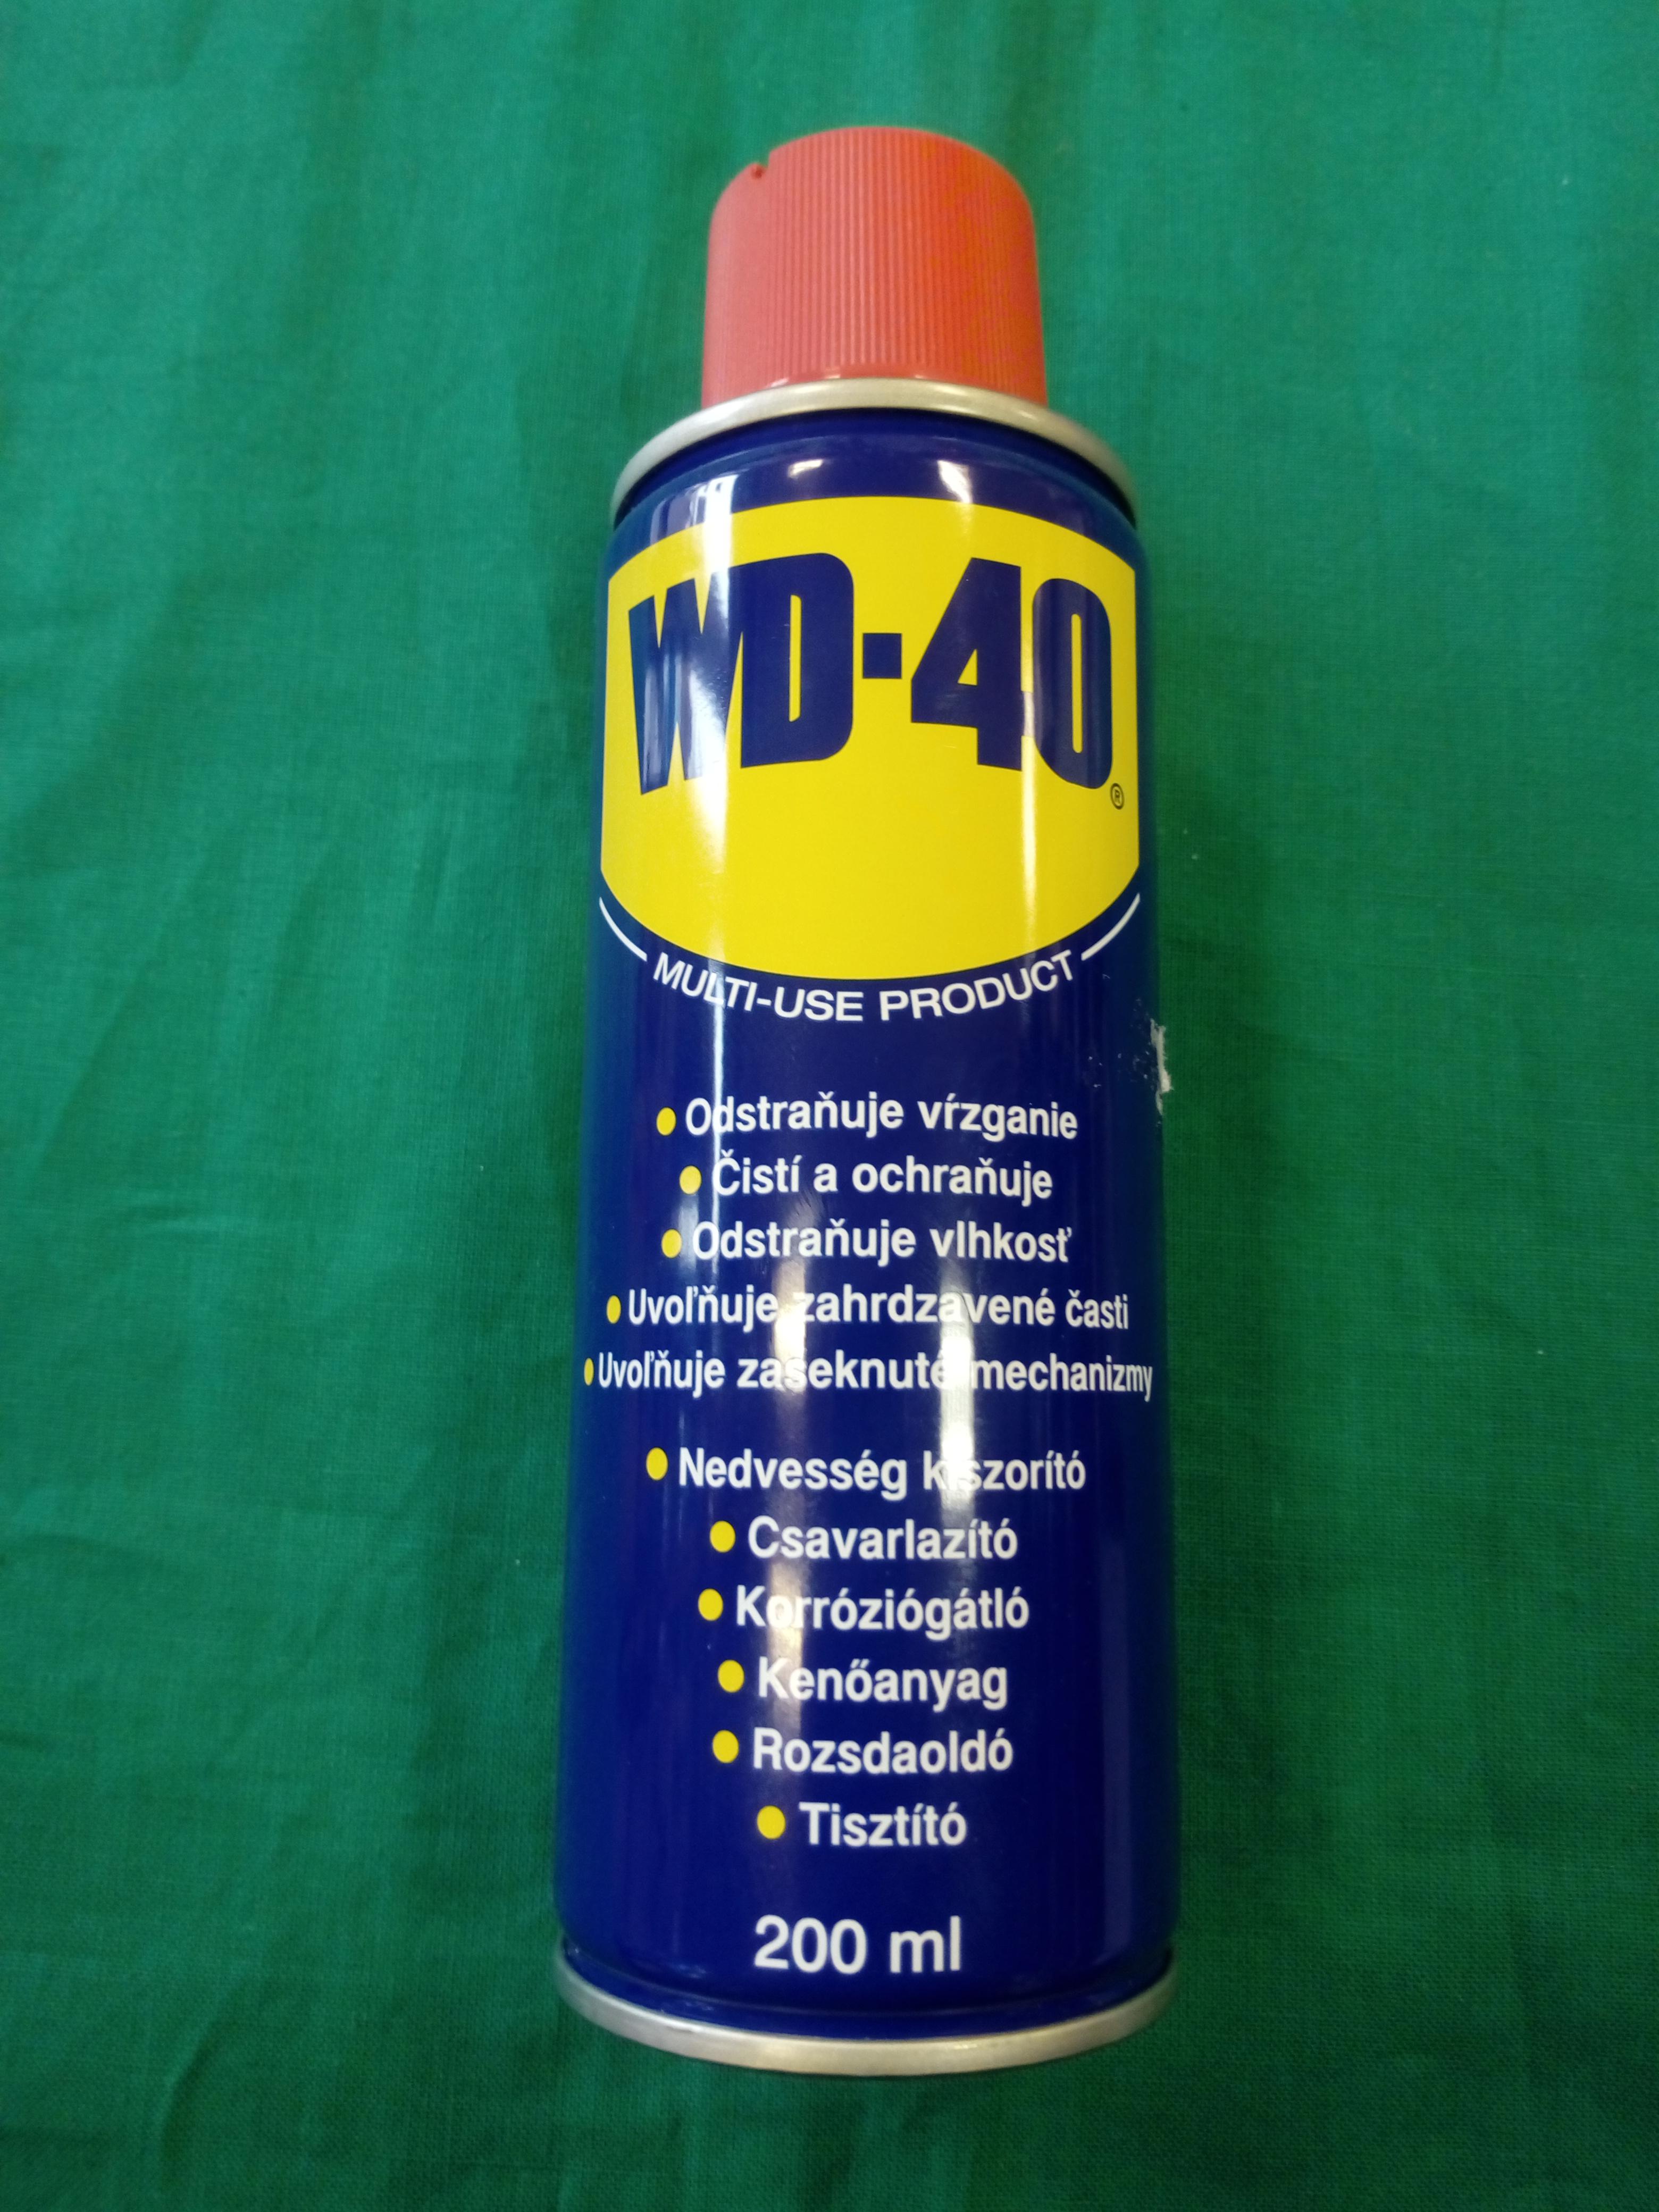 WD-40 multifunkciós spray 200ml, kiemelt kép